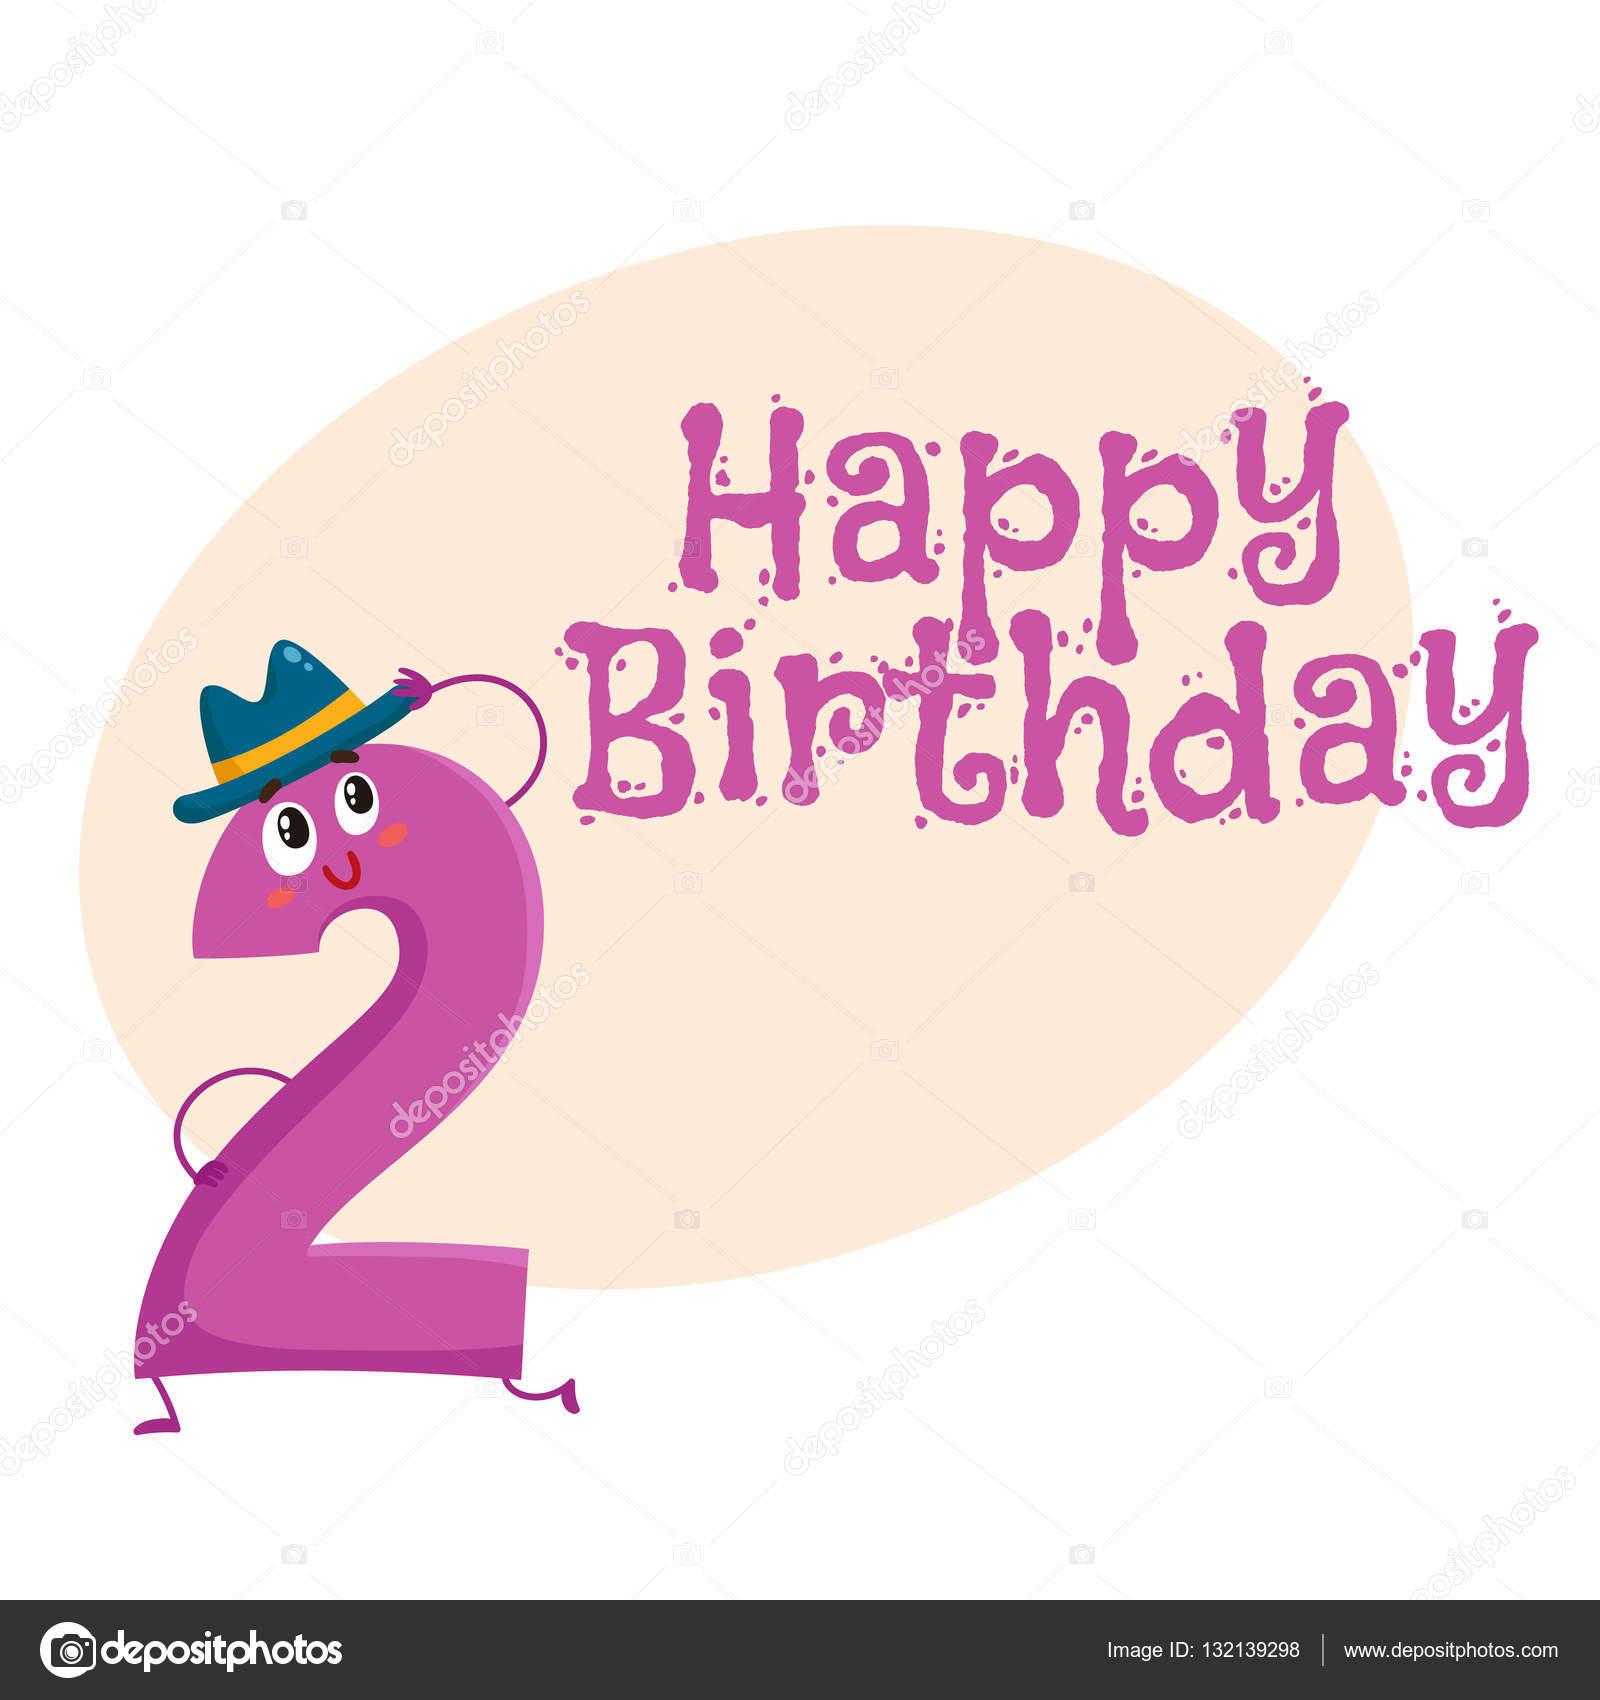 Happy birthday vector greeting card design with two number happy birthday vector greeting card design with two number characters stock vector kristyandbryce Gallery